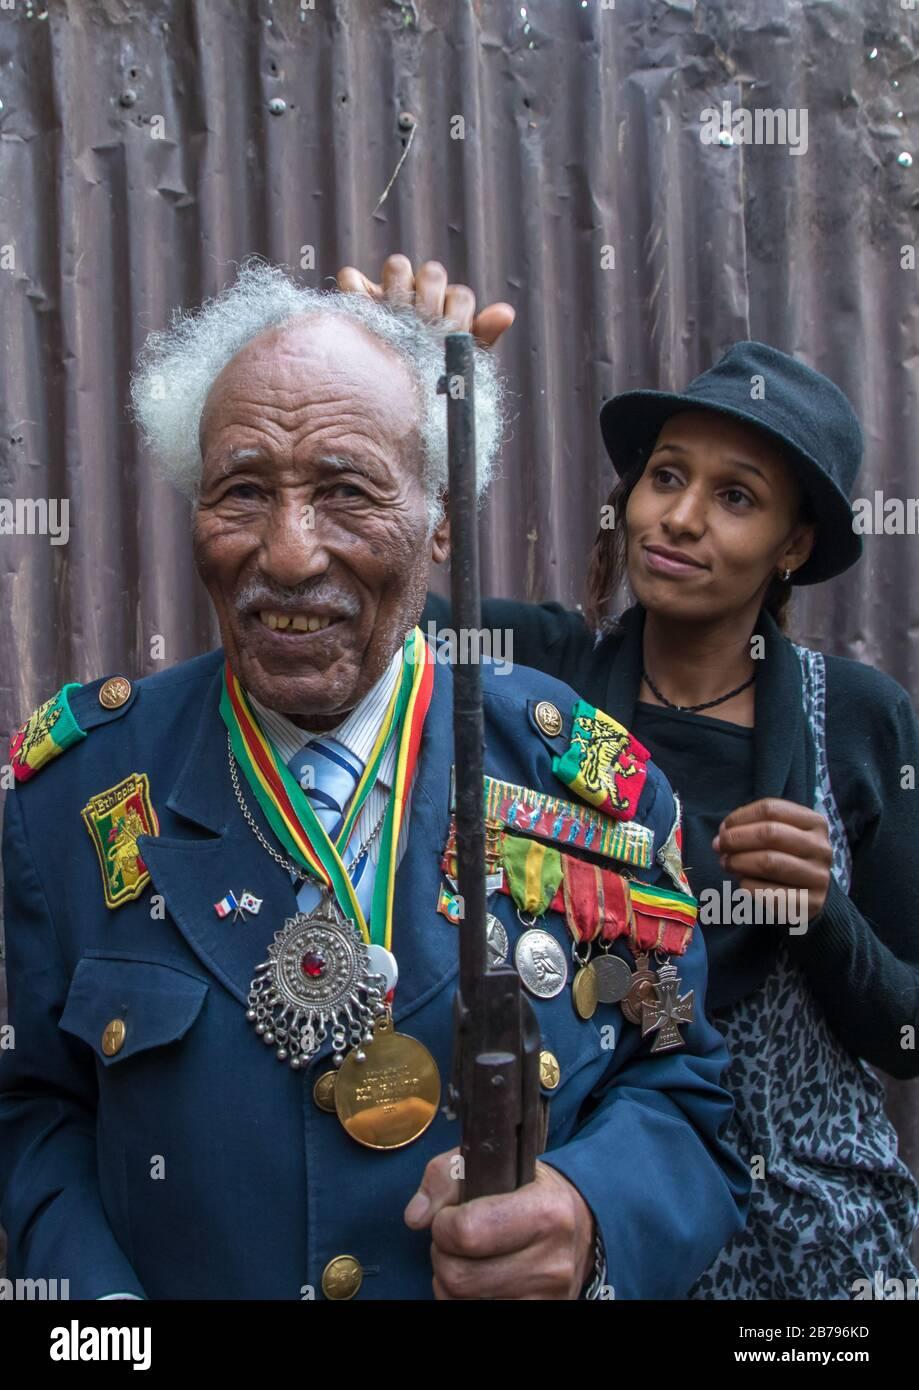 Ethiopian veteran from the italo-ethiopian war with his daughter, Addis Ababa Region, Addis Ababa, Ethiopia Stock Photo